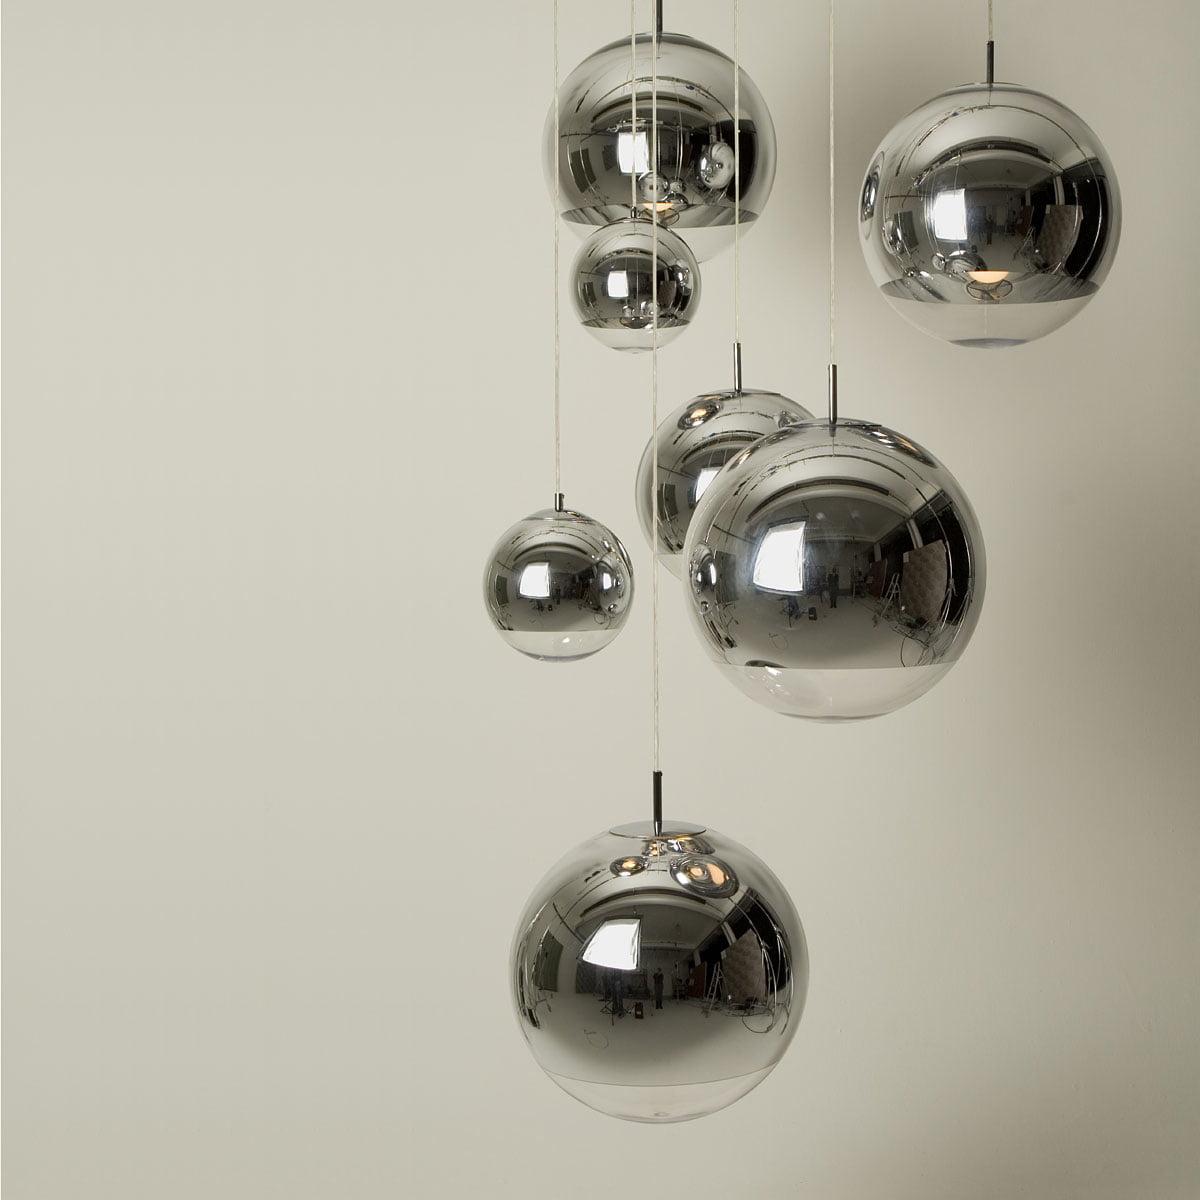 lampe suspension mirror ball par tom dixon. Black Bedroom Furniture Sets. Home Design Ideas